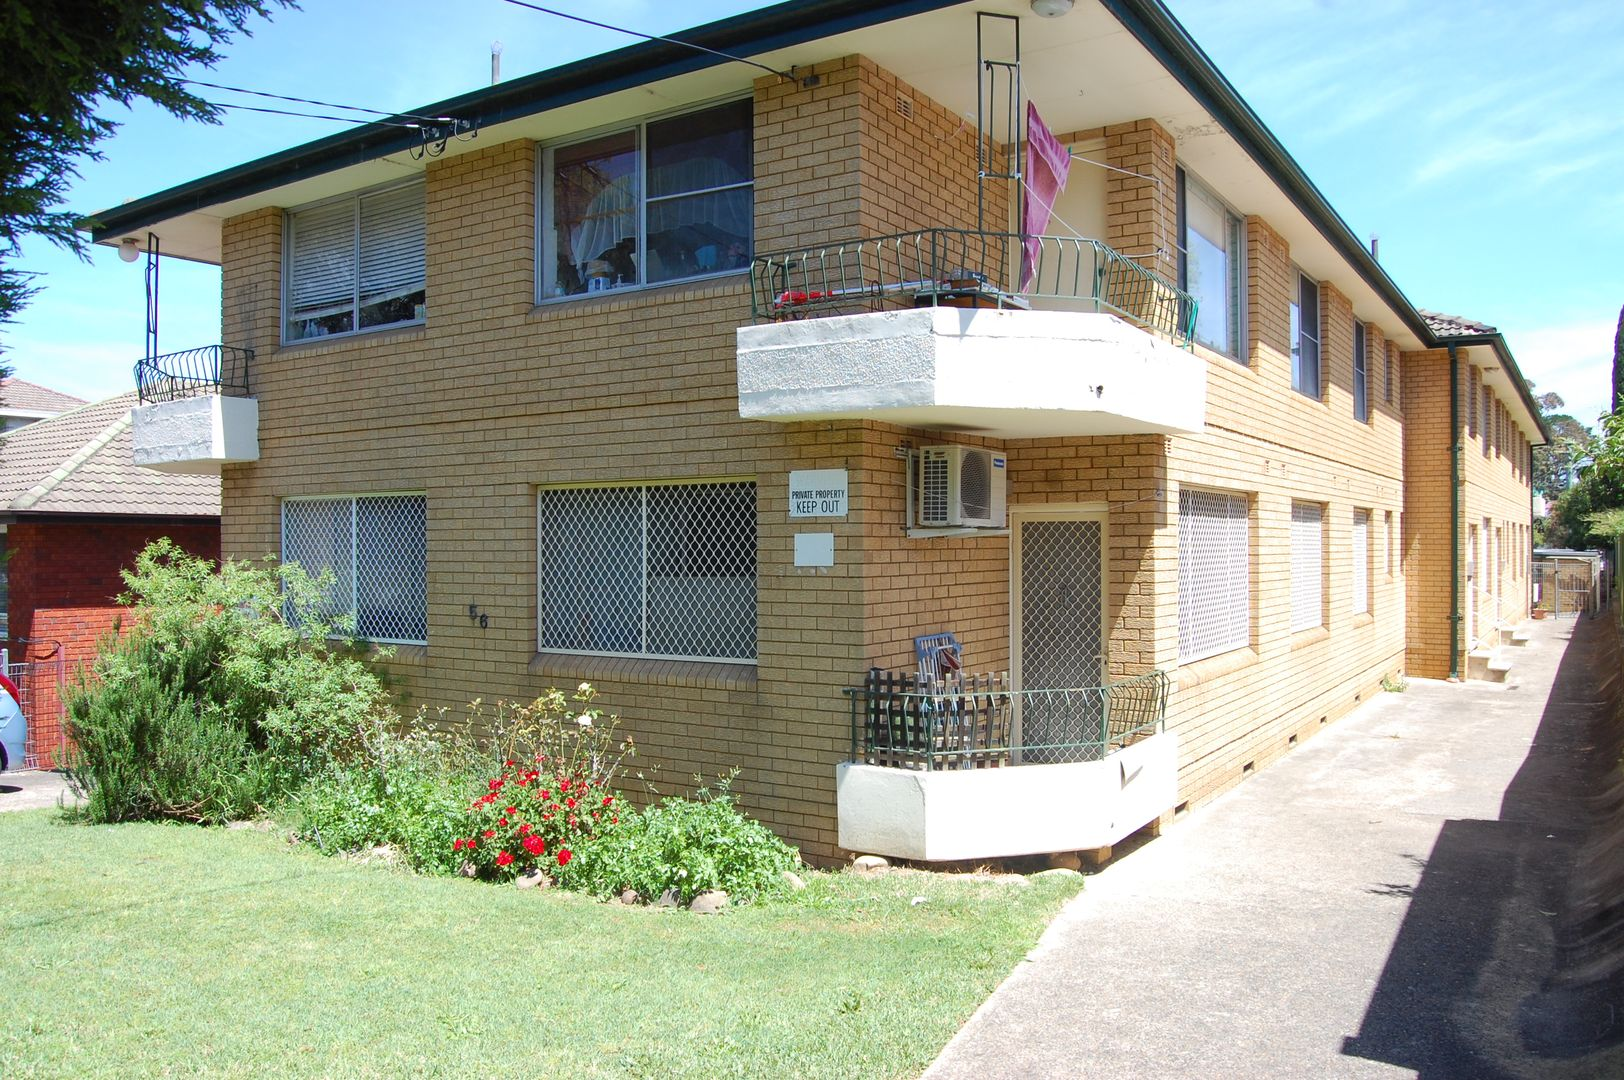 7/56 Crinan Street, Hurlstone Park NSW 2193, Image 0